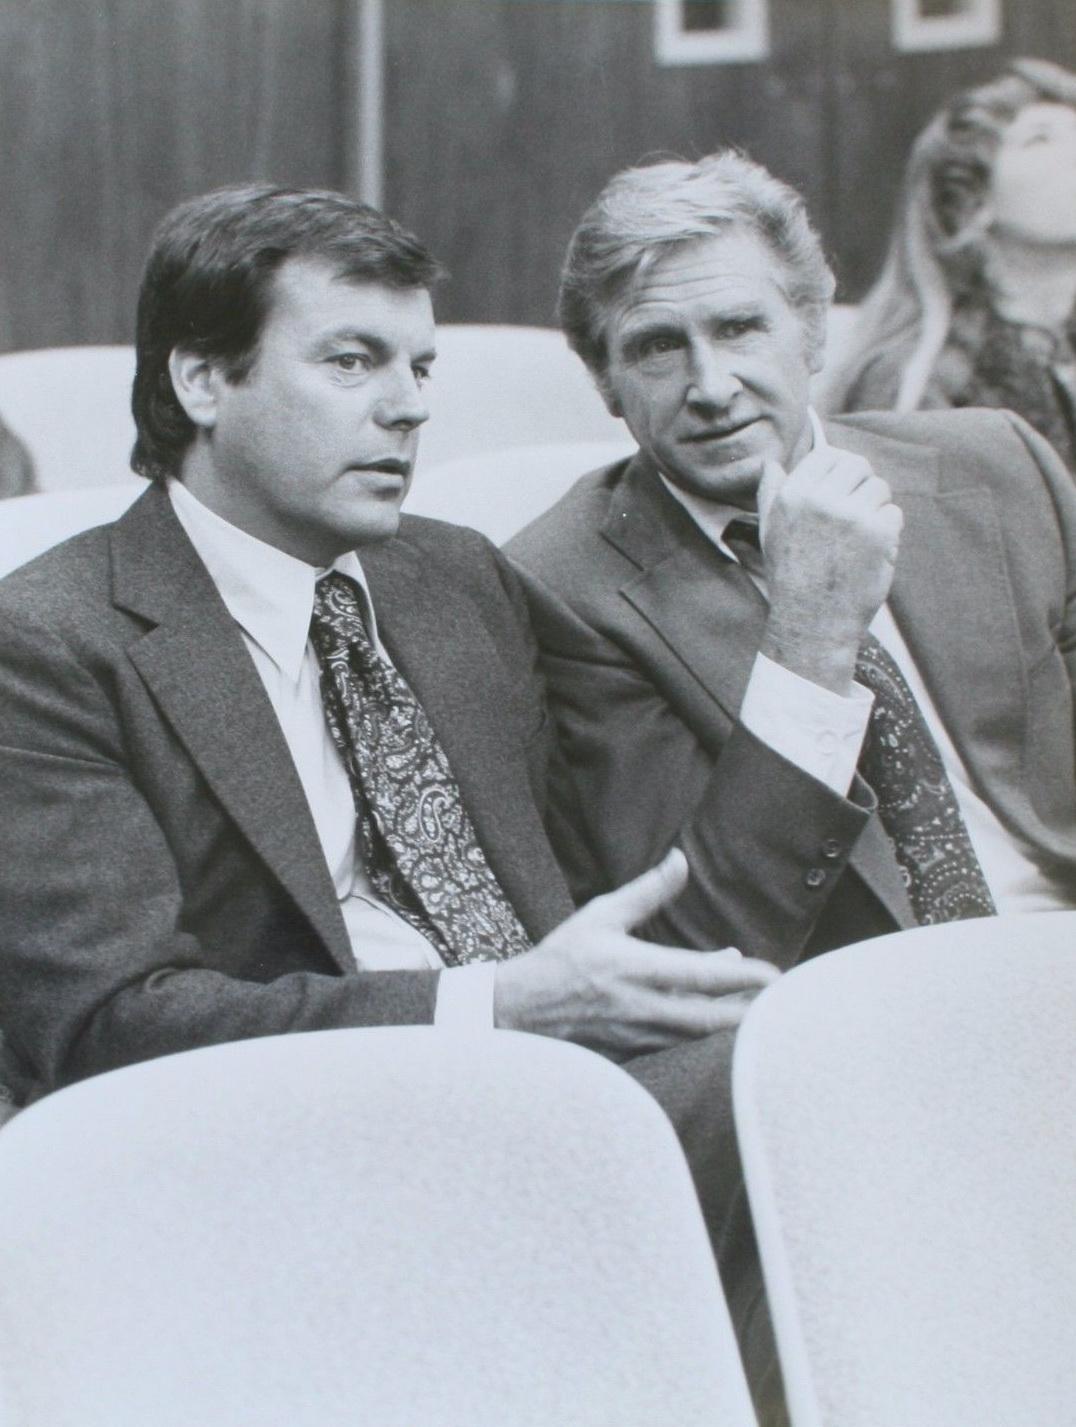 Lloyd Bridges and Robert Wagner in The Critical List (1978)